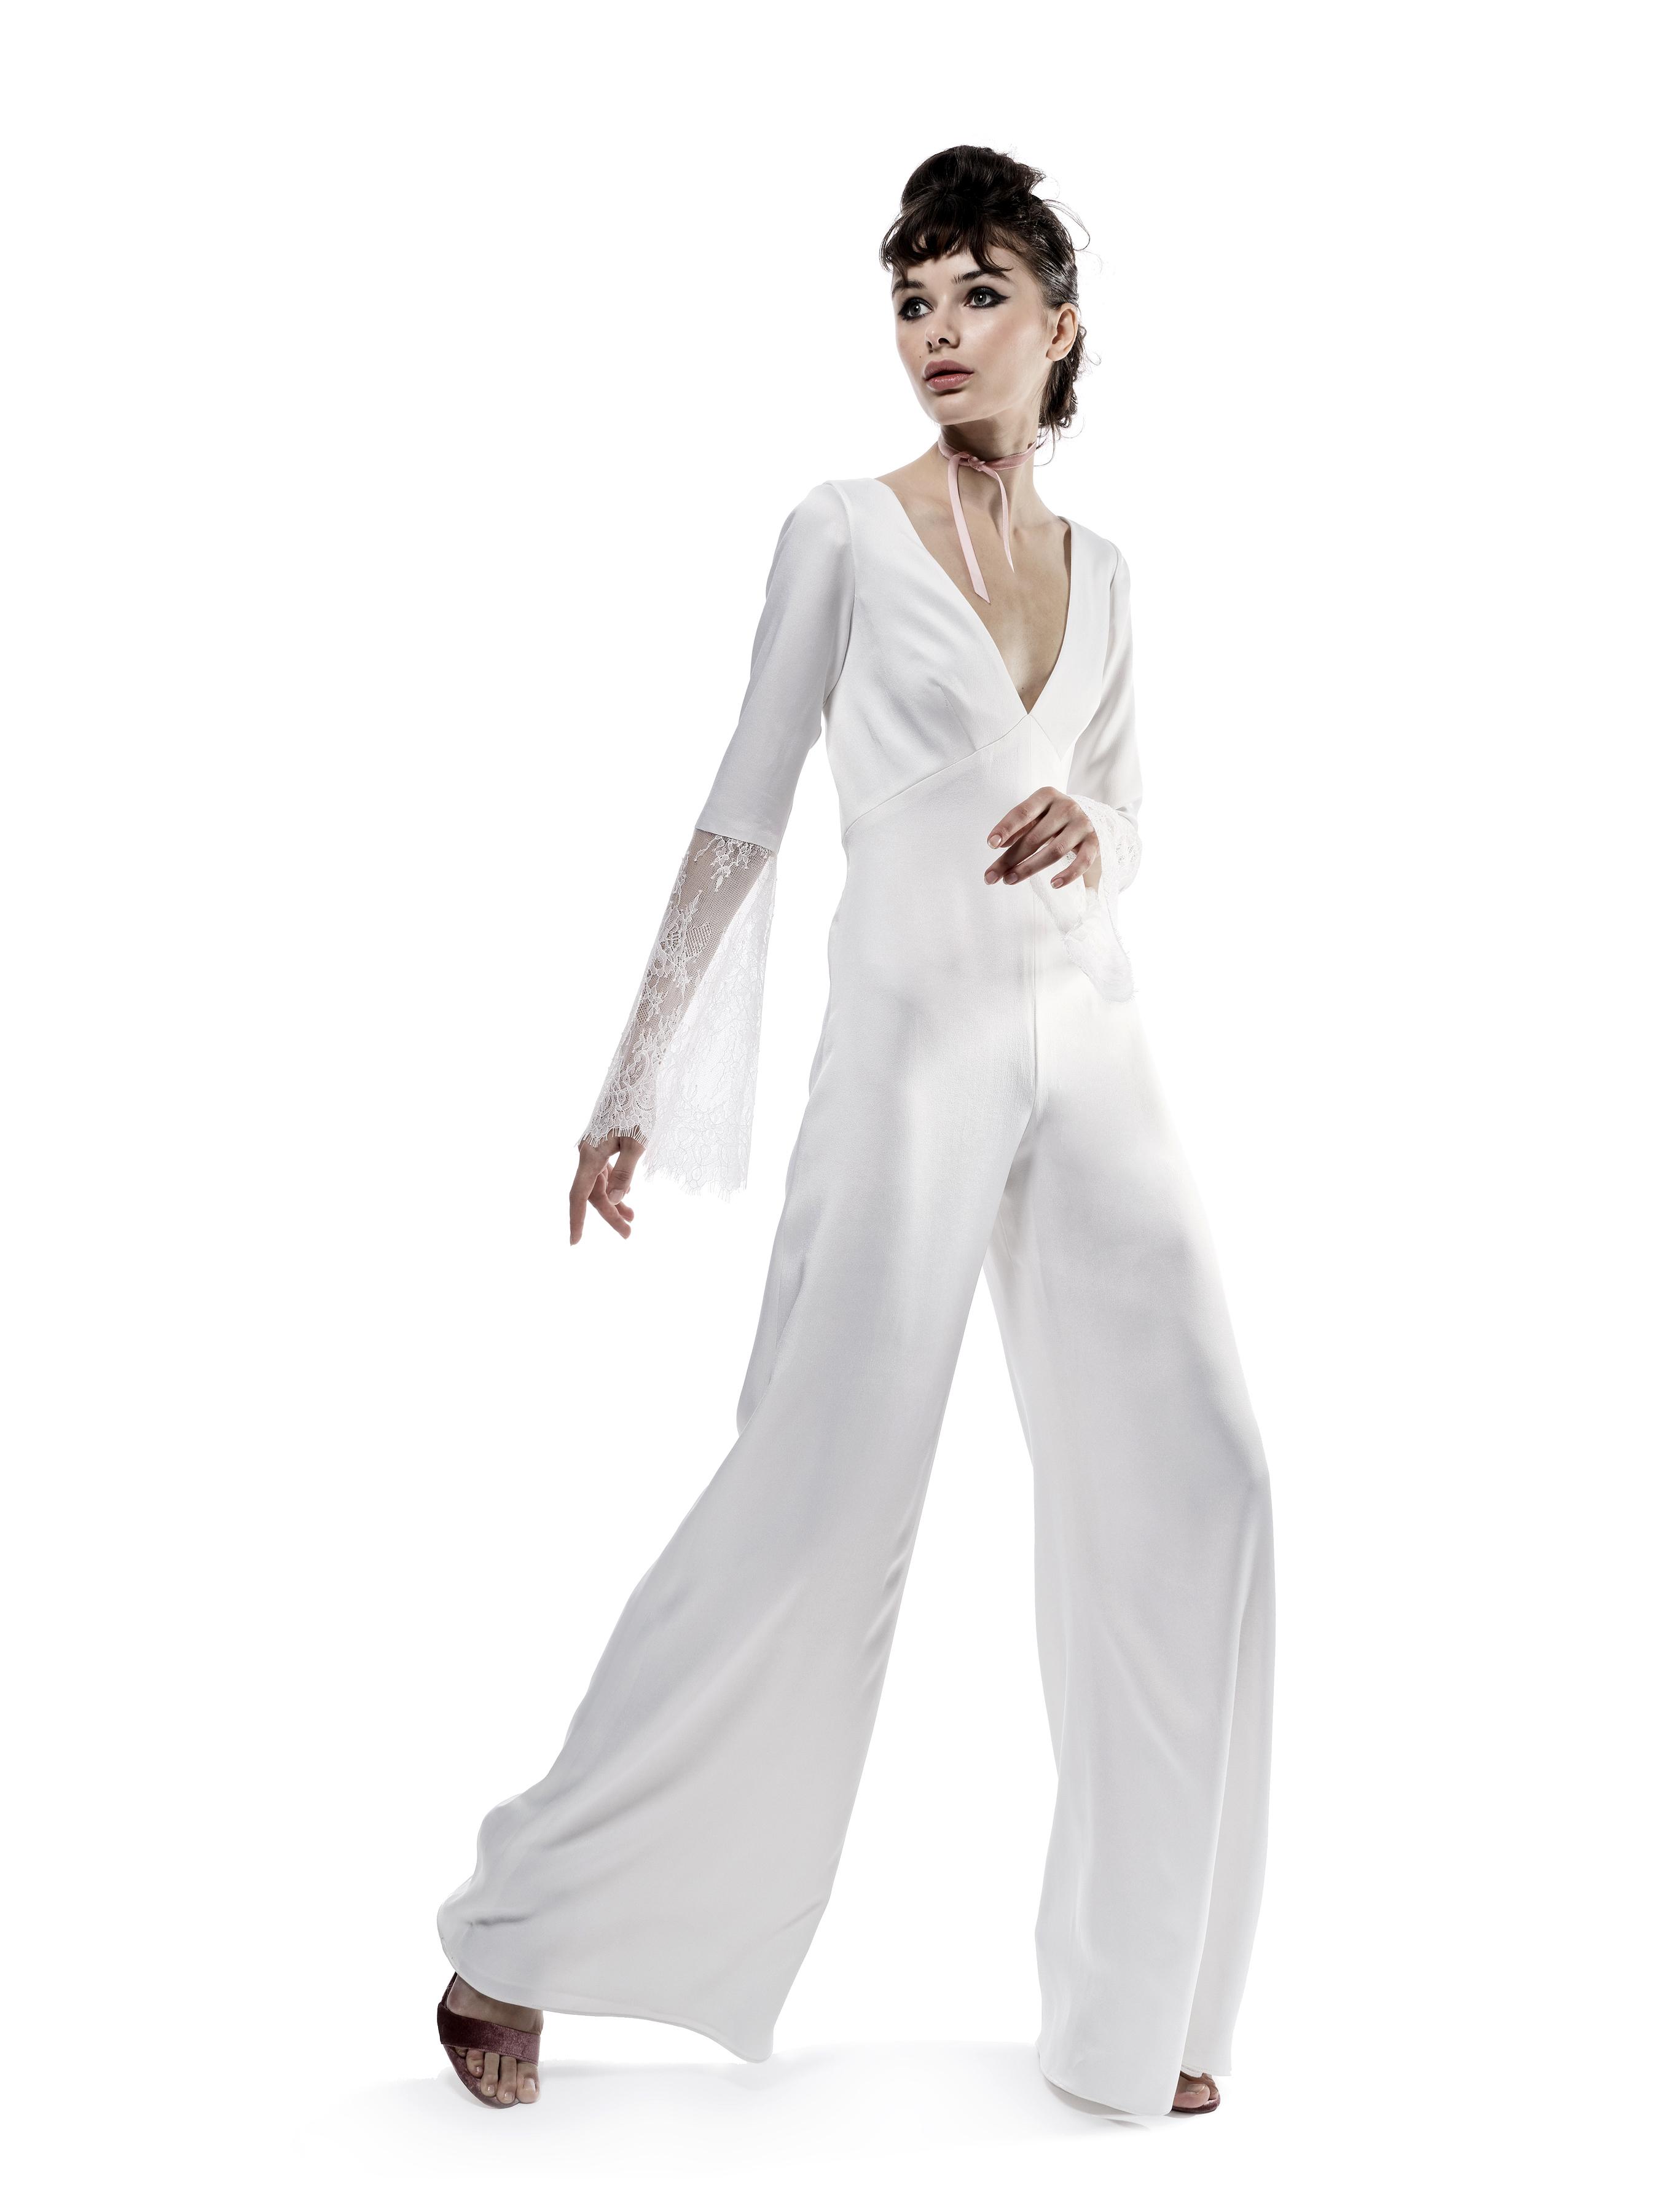 elizabeth fillmore wedding dress fall 2018 jumpsuit deep v neck long sleeves